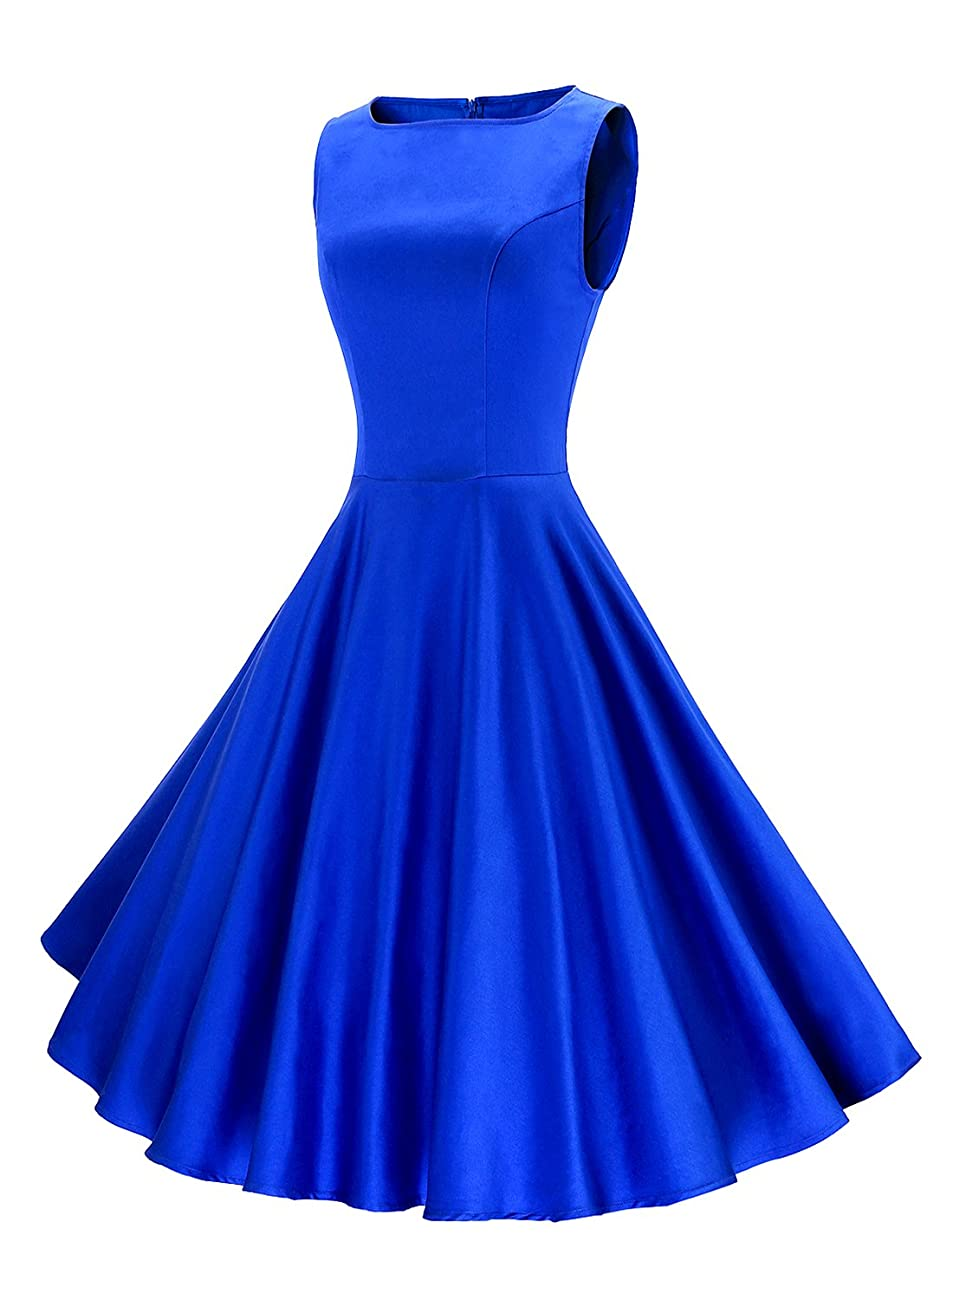 Anni Coco Women's Classy Audrey Hepburn 1950s Vintage Rockabilly Swing Dress blue 1